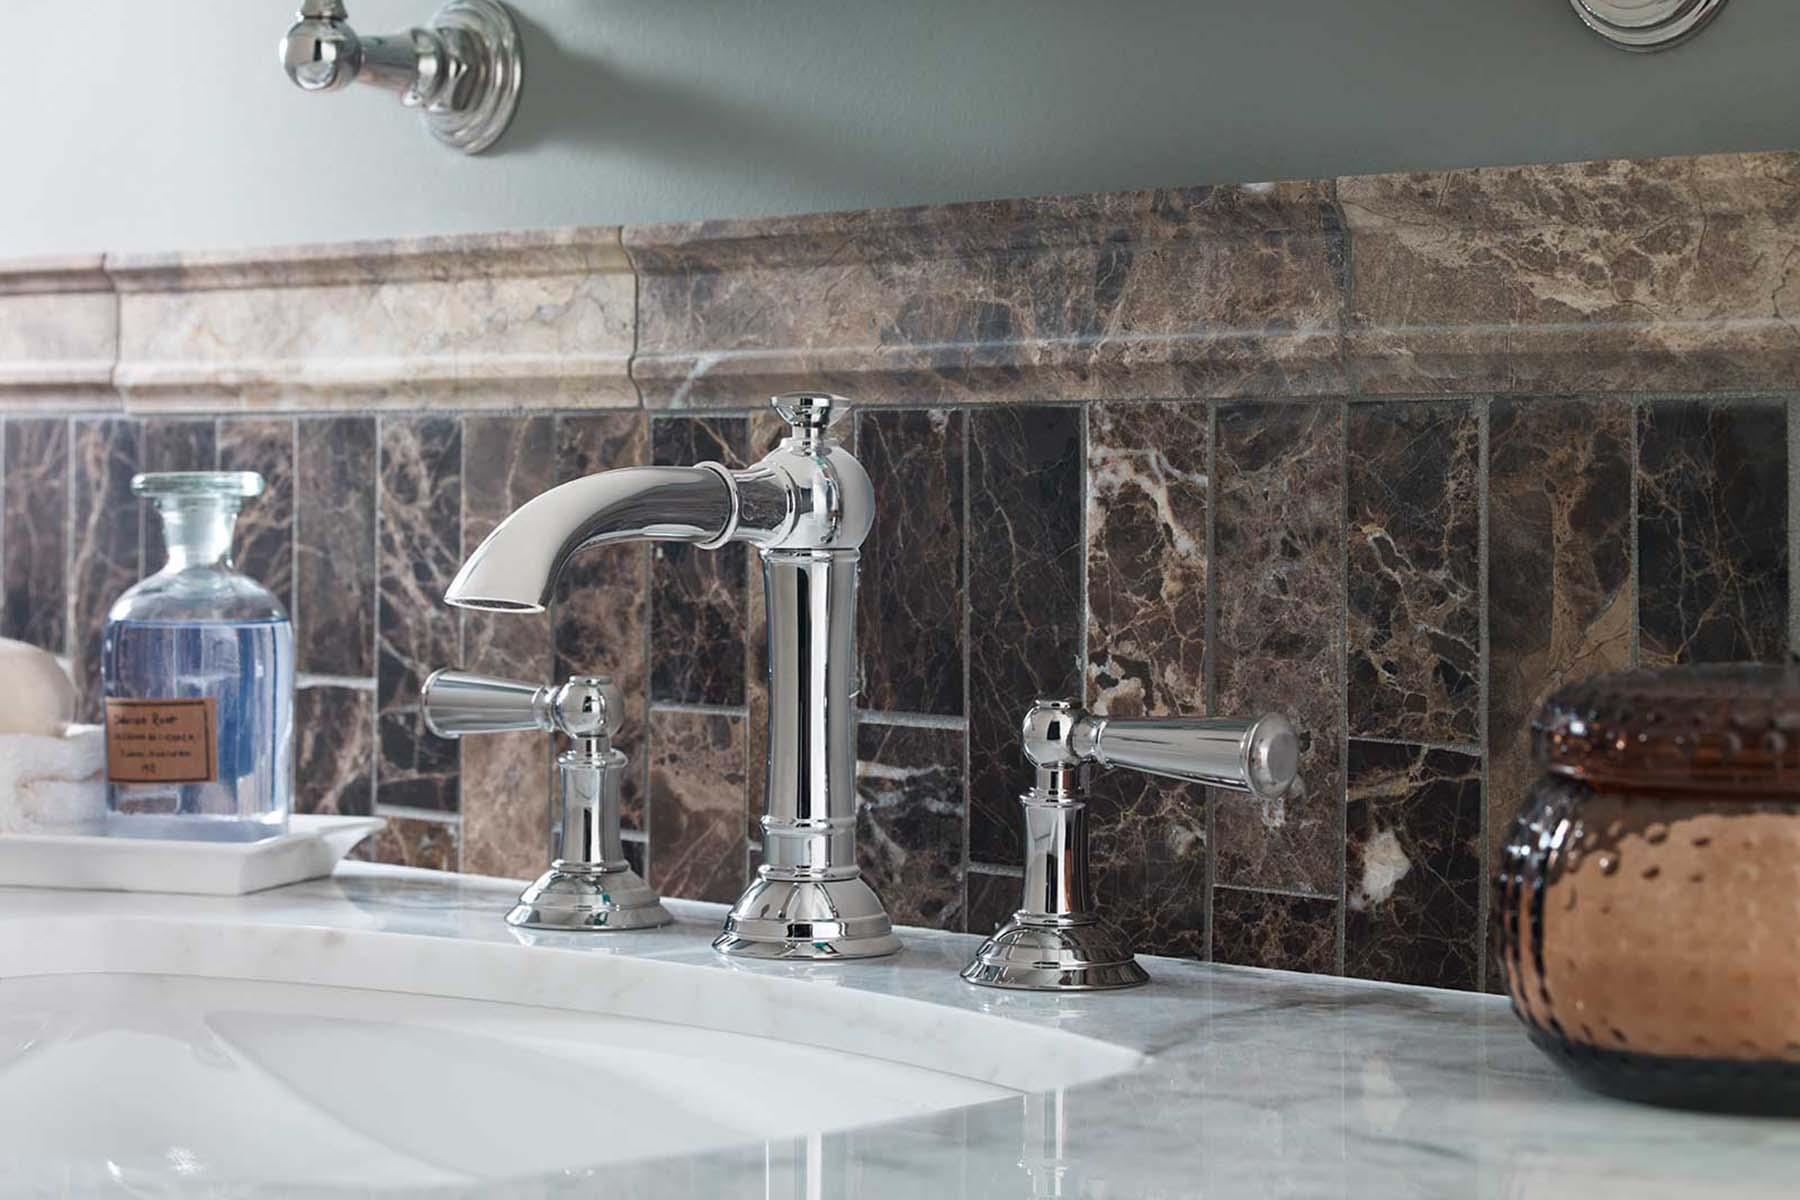 Bathroom Advance Plumbing And Heating Supply Company Walled Lake Detroit Michigan